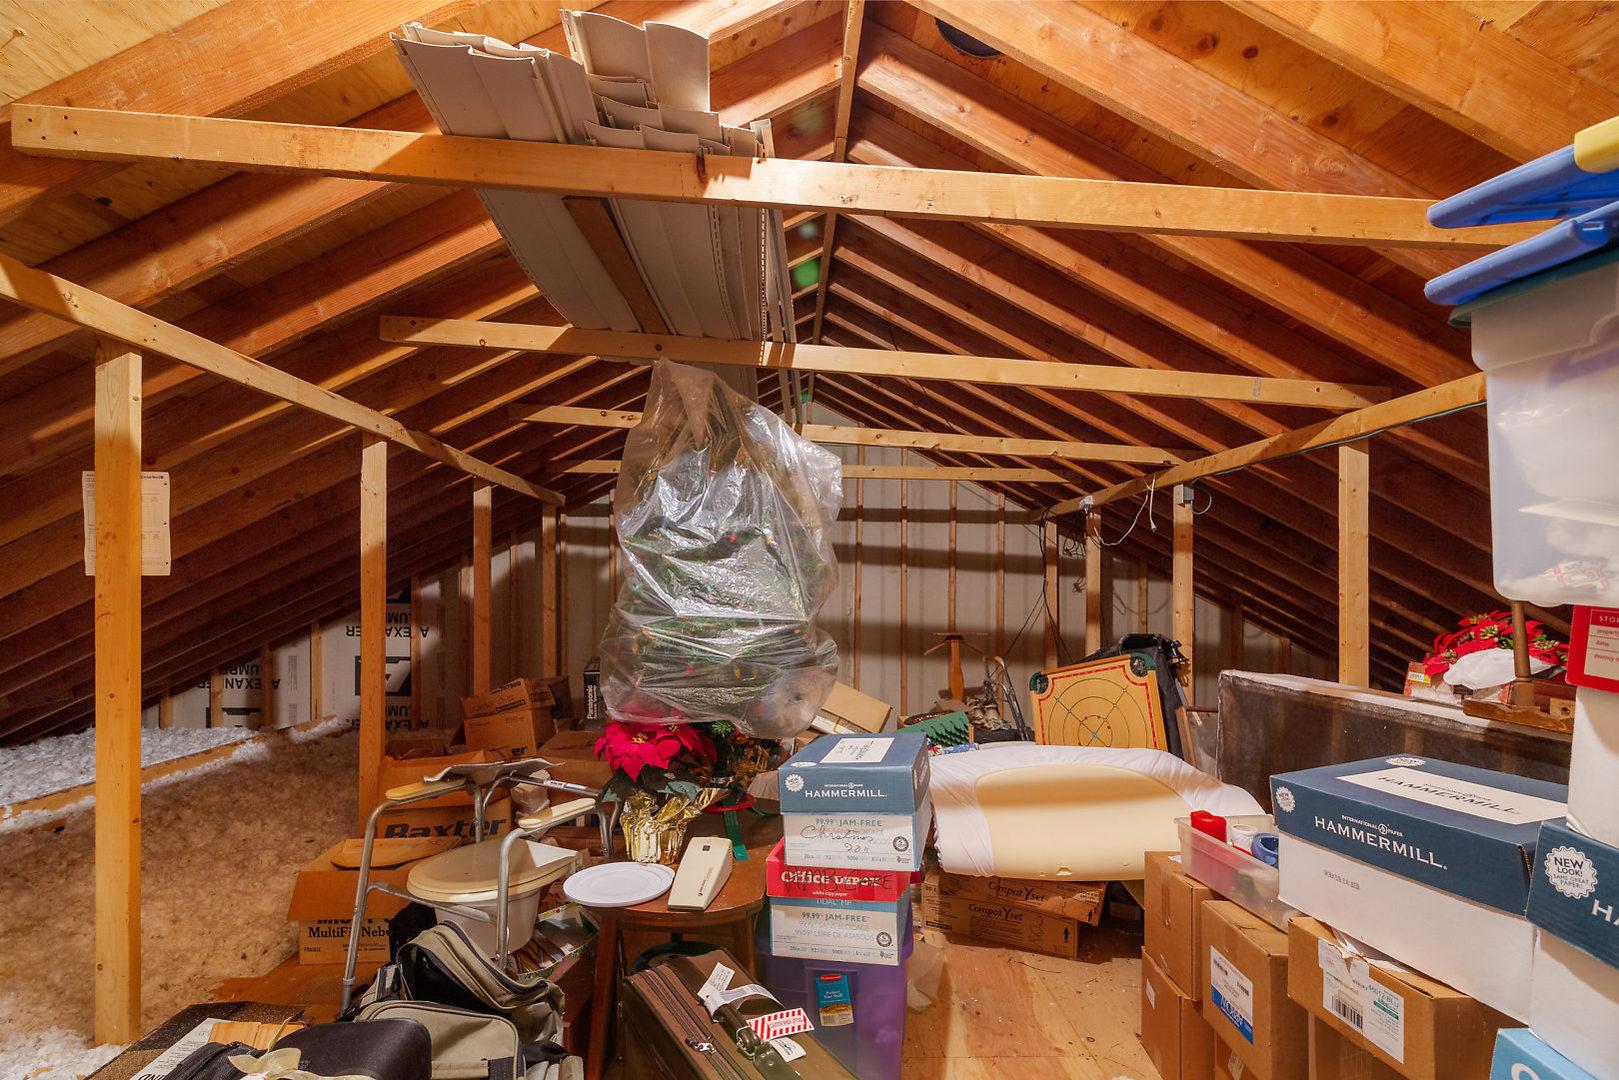 2712 North 3853rd, Sheridan, Illinois, 60551